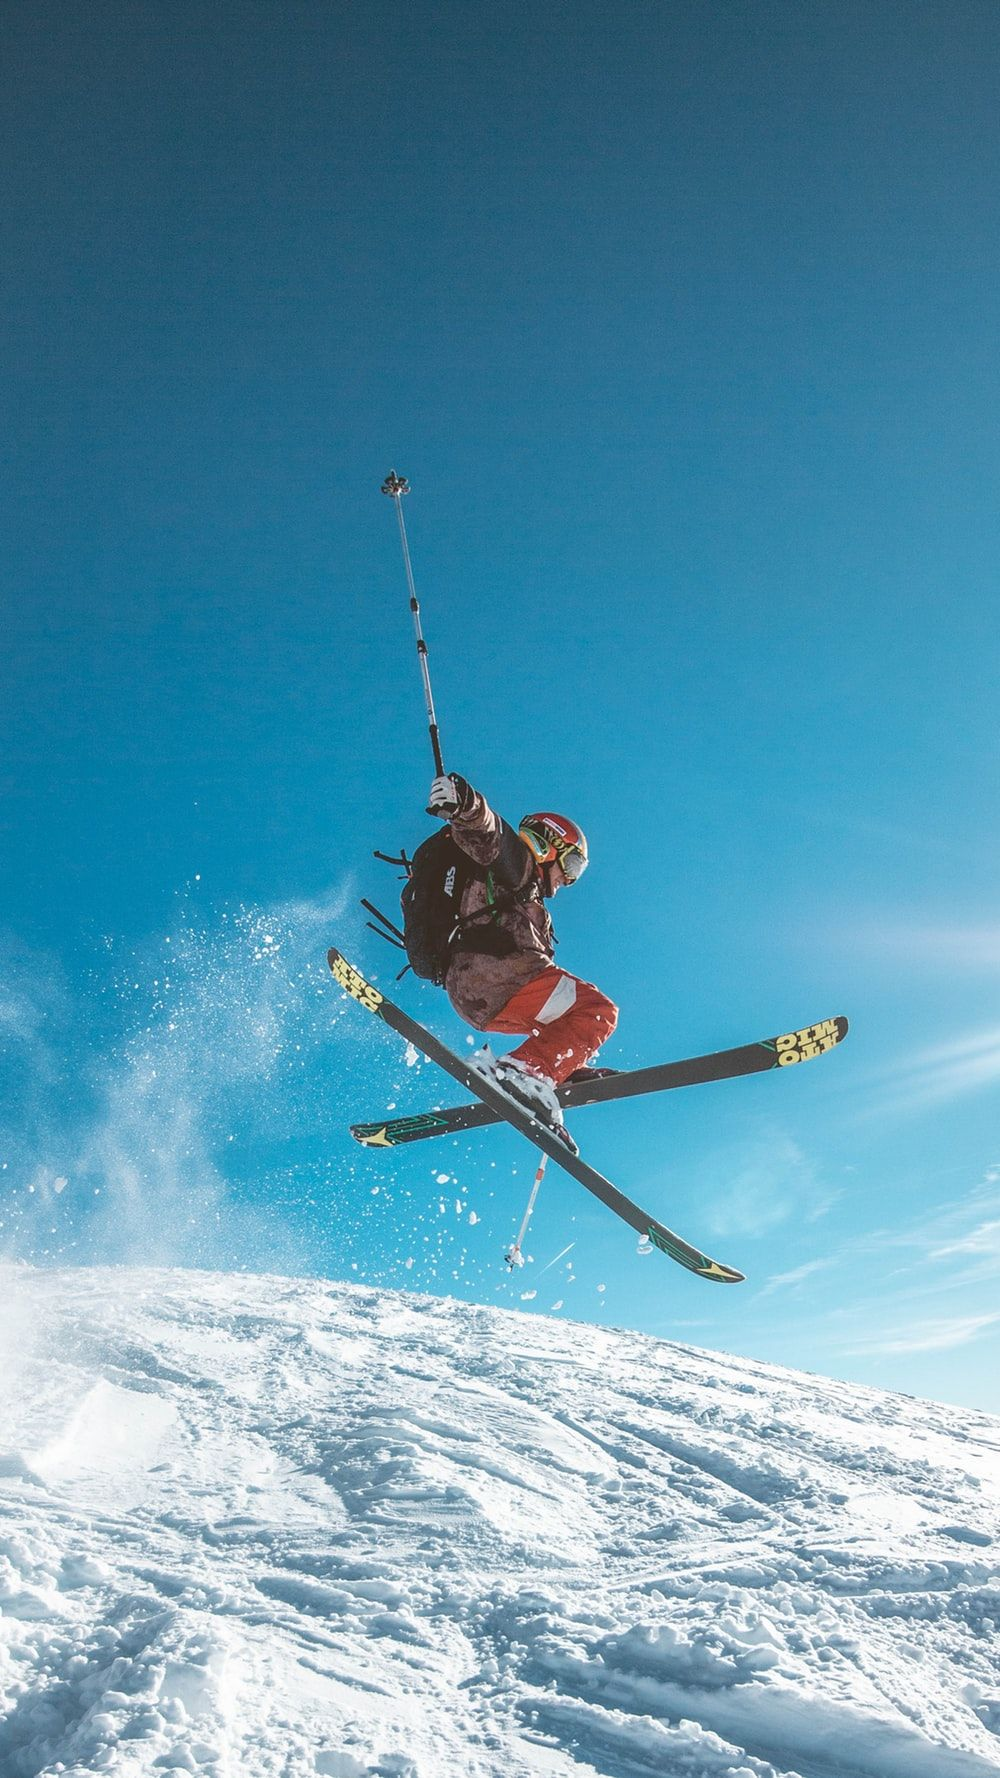 Ski iPhone Wallpapers   Top Ski iPhone Backgrounds 1000x1778